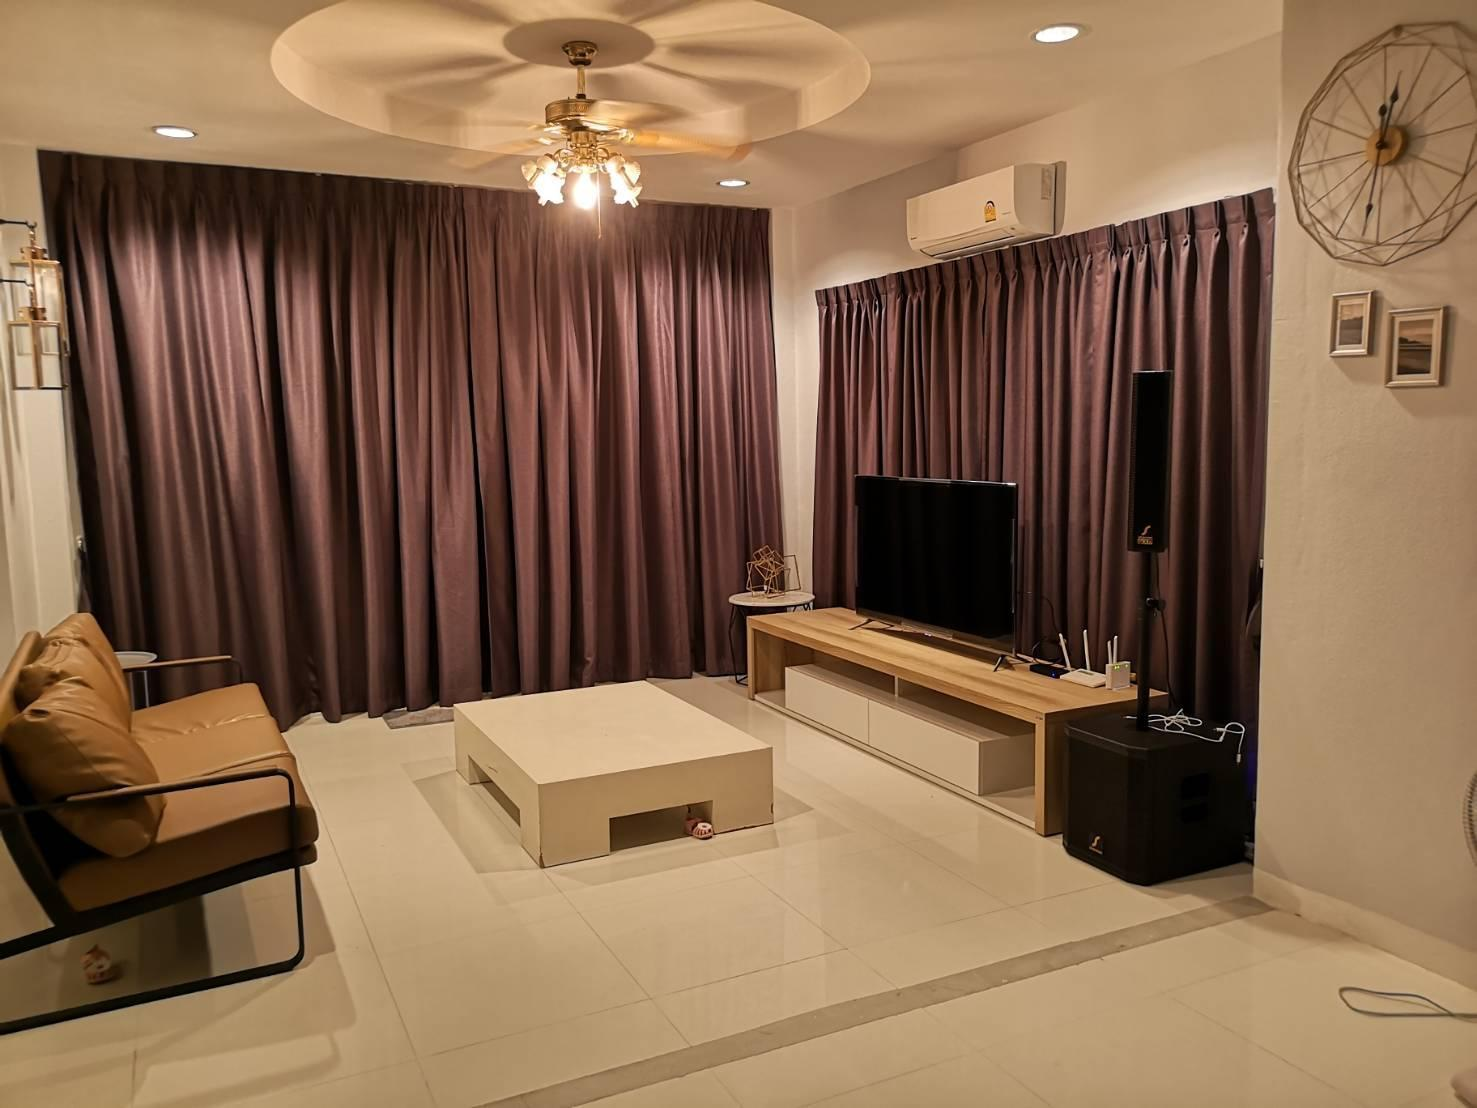 Baan Kiang Lay Phu View Hua Hin Pool Villa วิลลา 3 ห้องนอน 3 ห้องน้ำส่วนตัว ขนาด 350 ตร.ม. – กลางเมืองหัวหิน